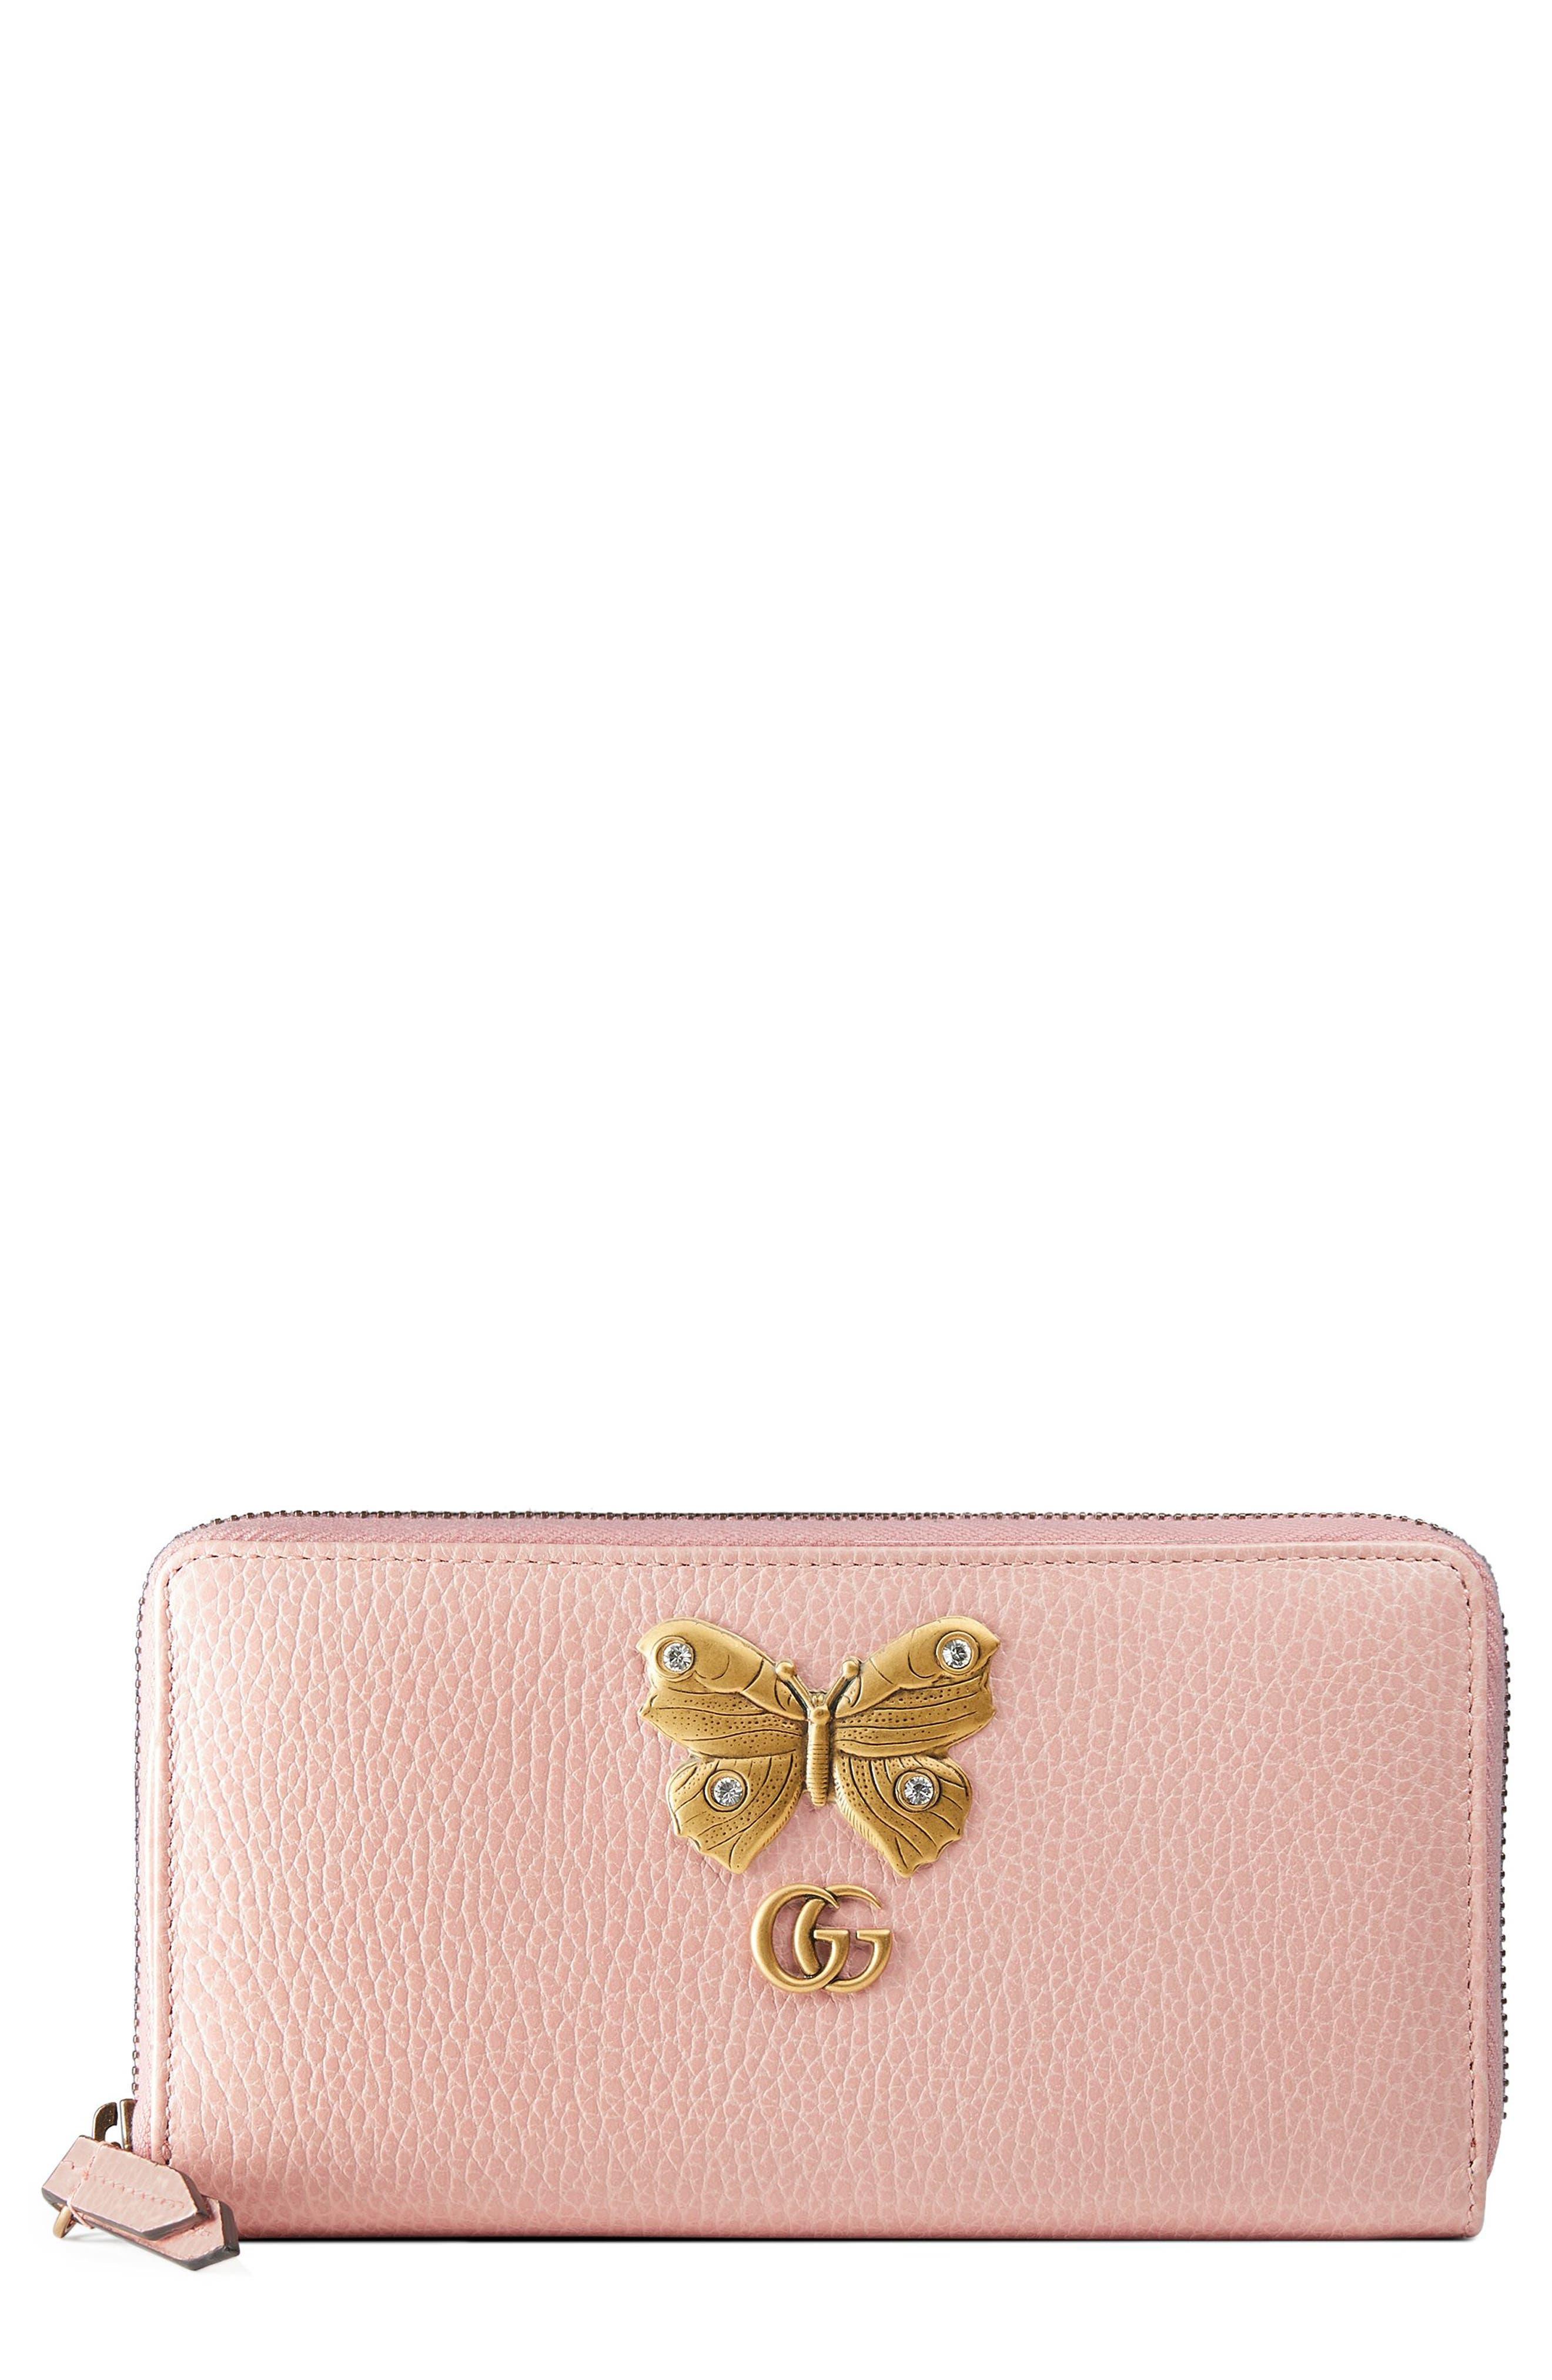 Main Image - Gucci Farfalla Zip Around Leather Wallet